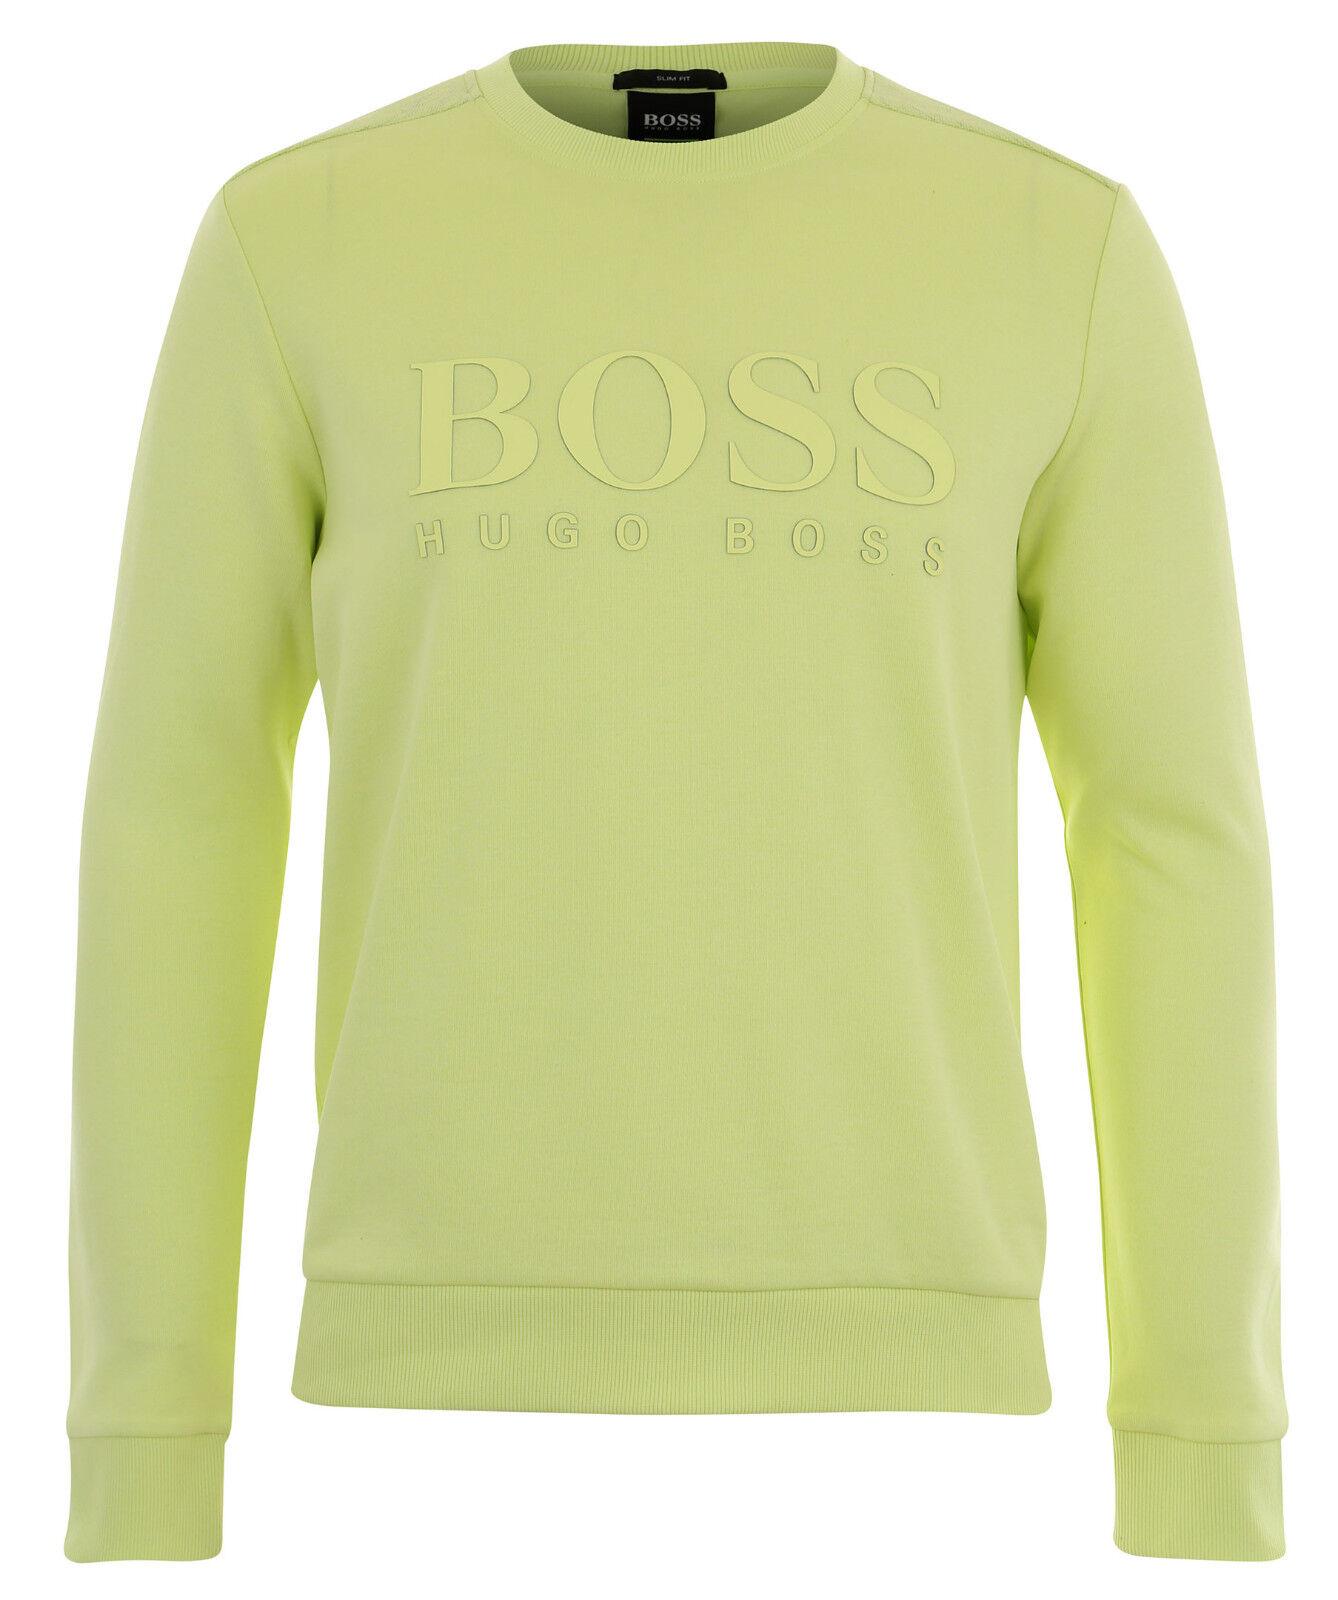 Boss Grün Cotton Salbo Sweater with Logo- Light Pastel Grün